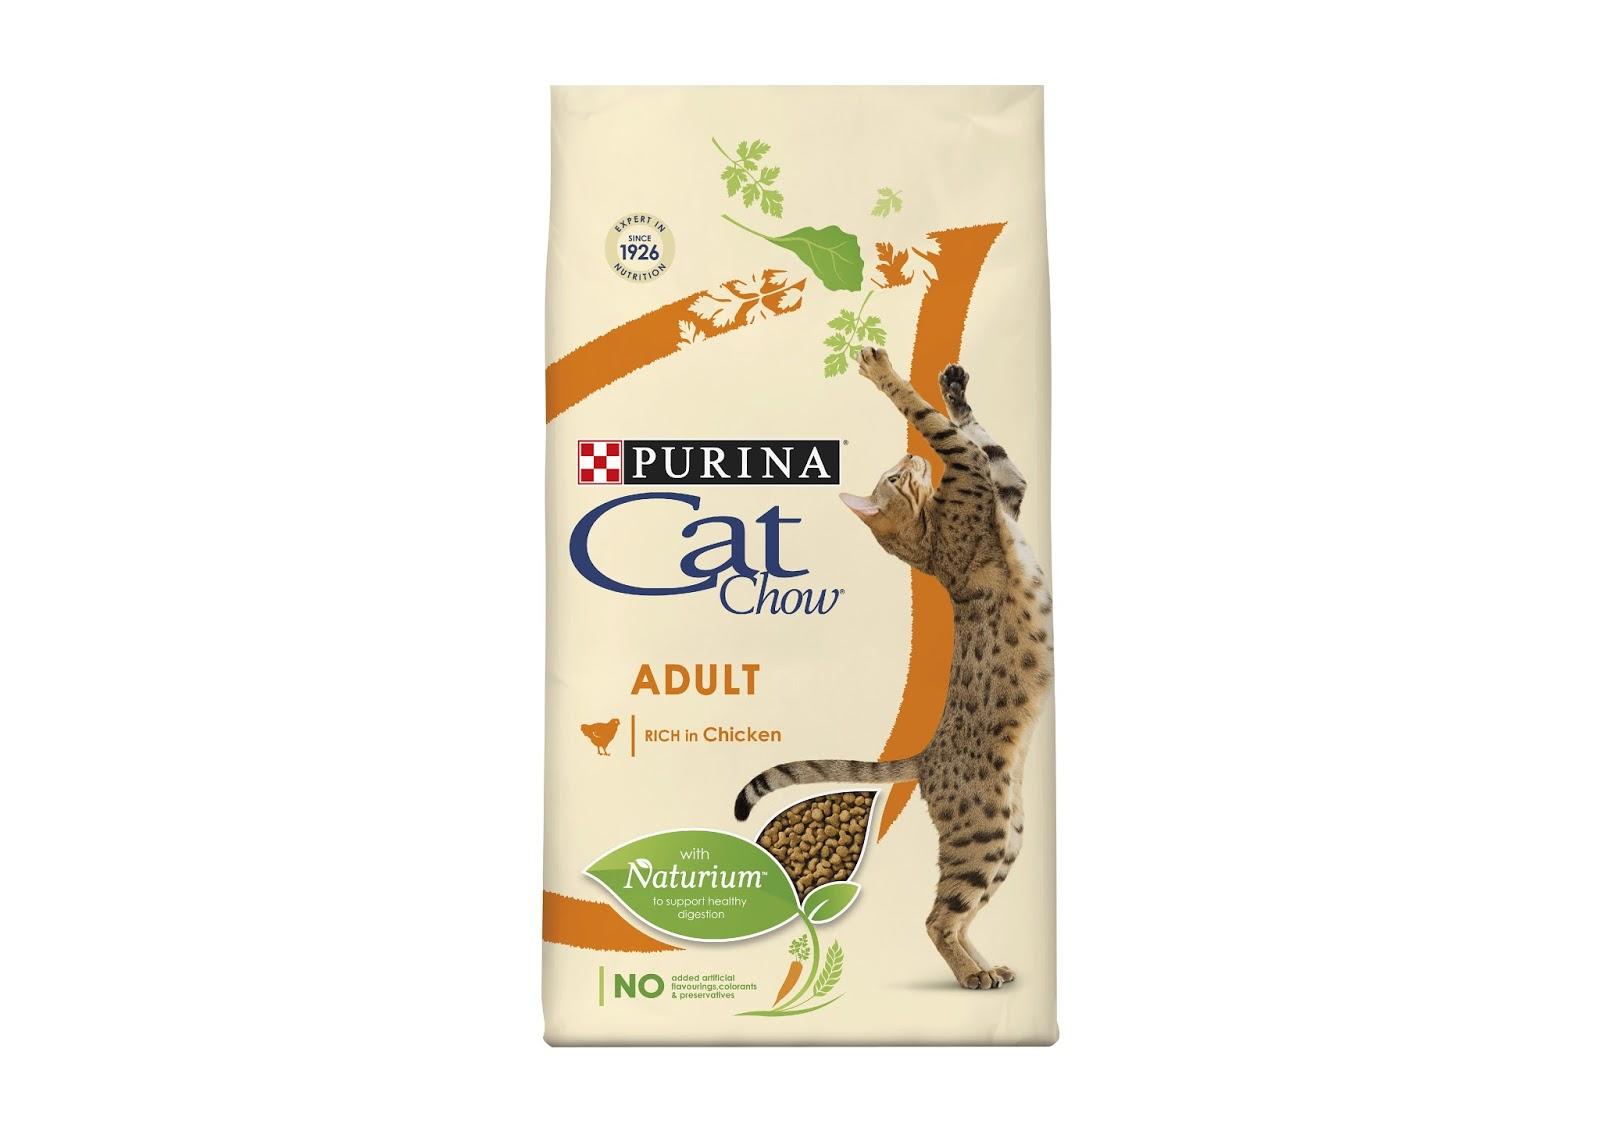 Purina Brand Natural Cat Food